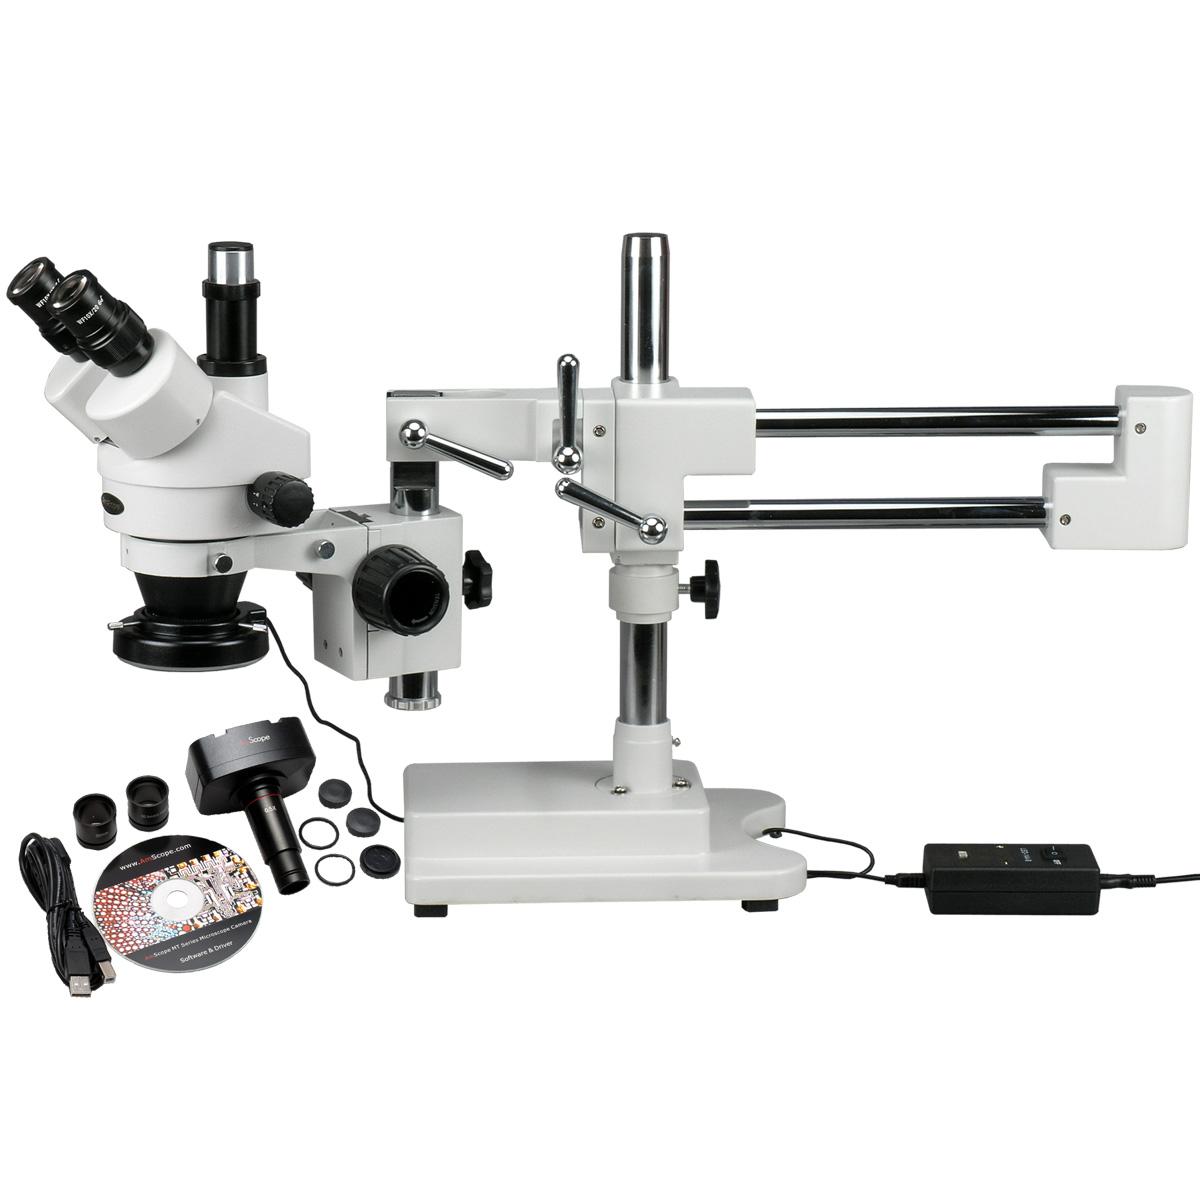 AmScope 3.5X-90X Circuit Zoom Stereo Microscope + 144 LED Light + 10MP Digital Camera New by United Scope, LLC